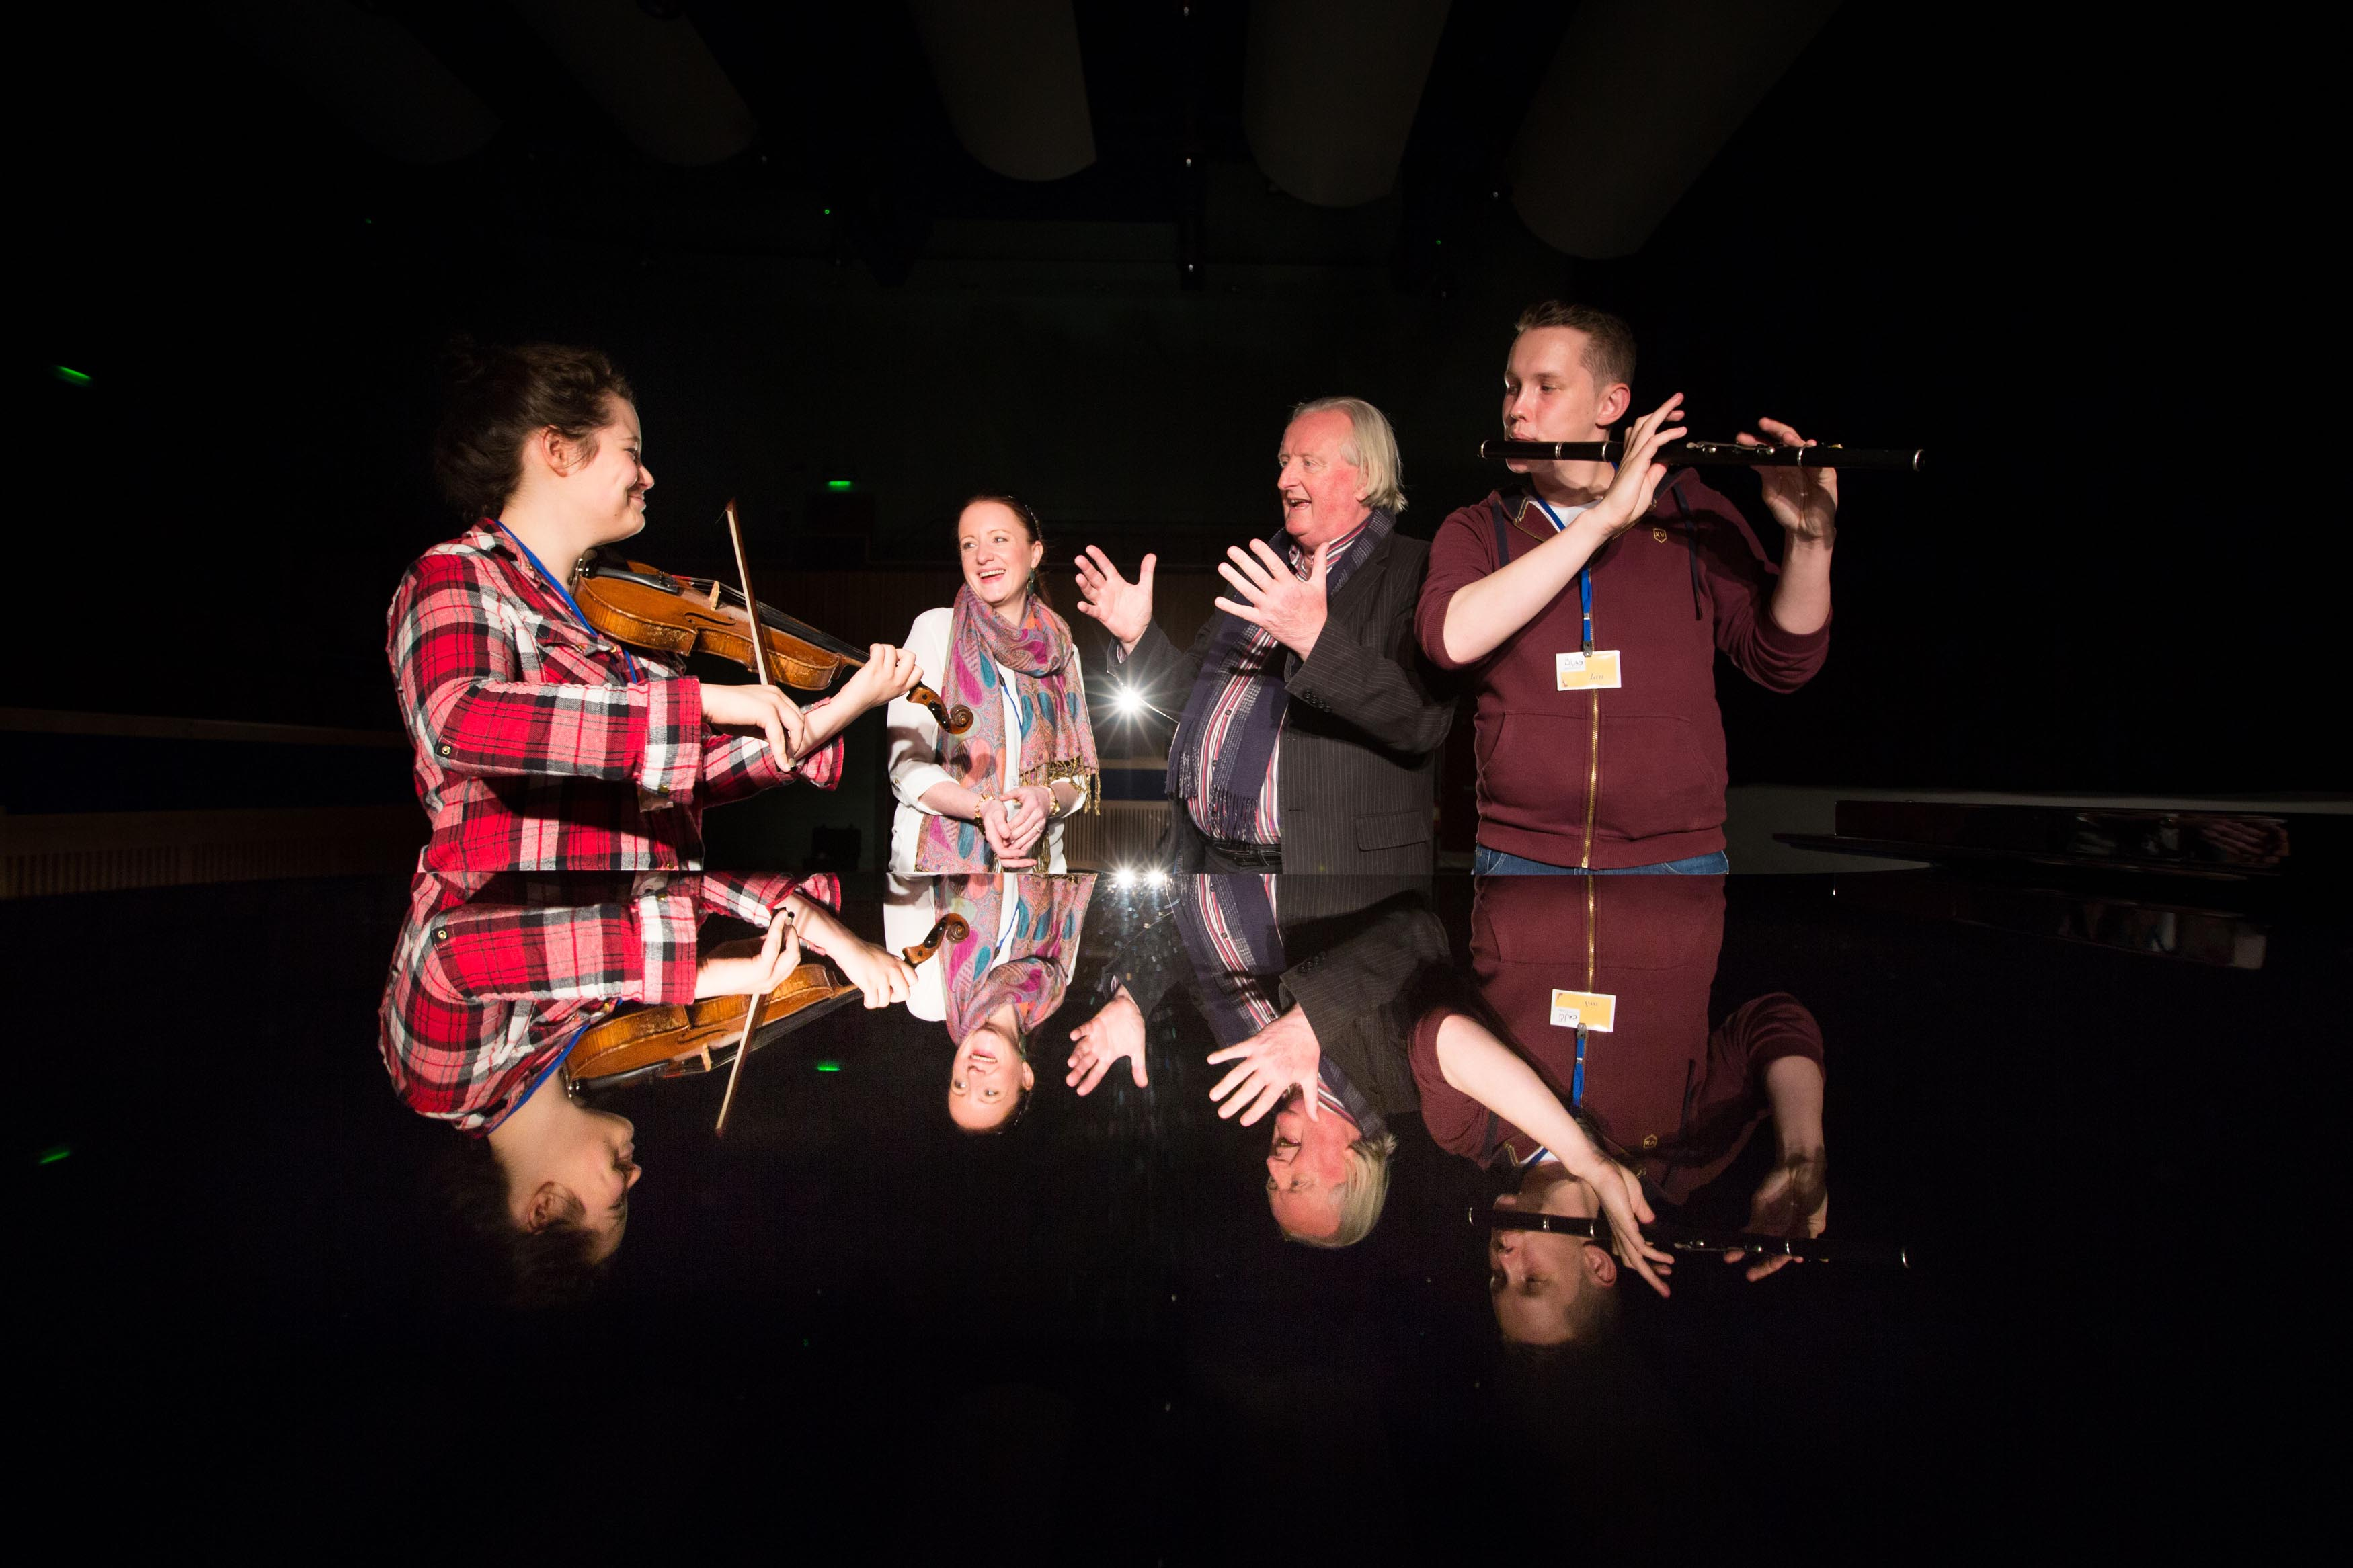 Summer Schools Bursaries Blas International Summer School of Irish Traditional Music and Dance returns to Limerick